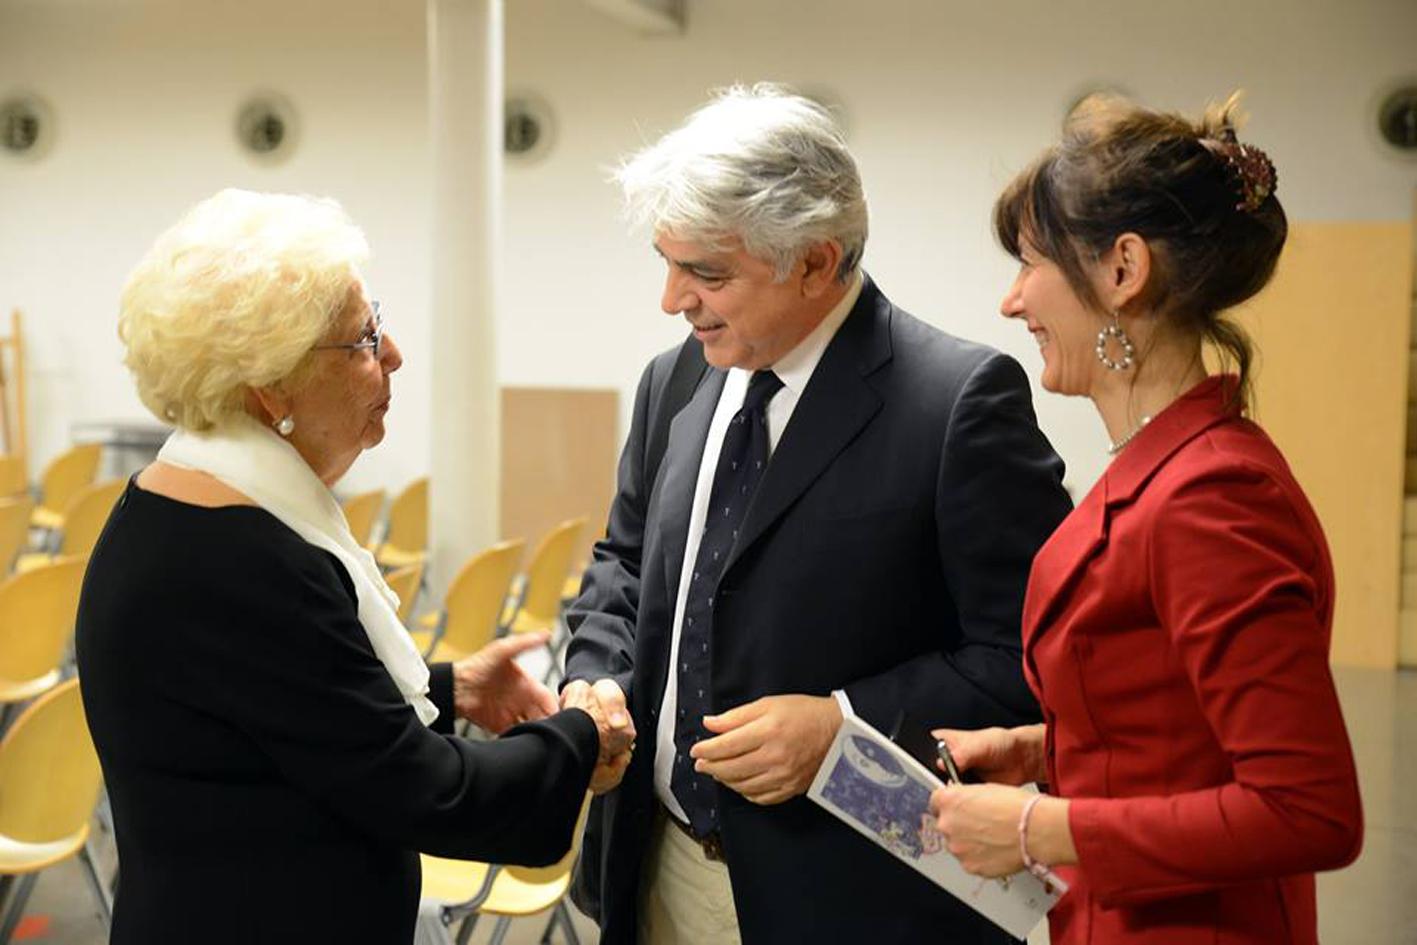 Tarcisio Mazzeo, Maria Varriale, Sabrina Burlando